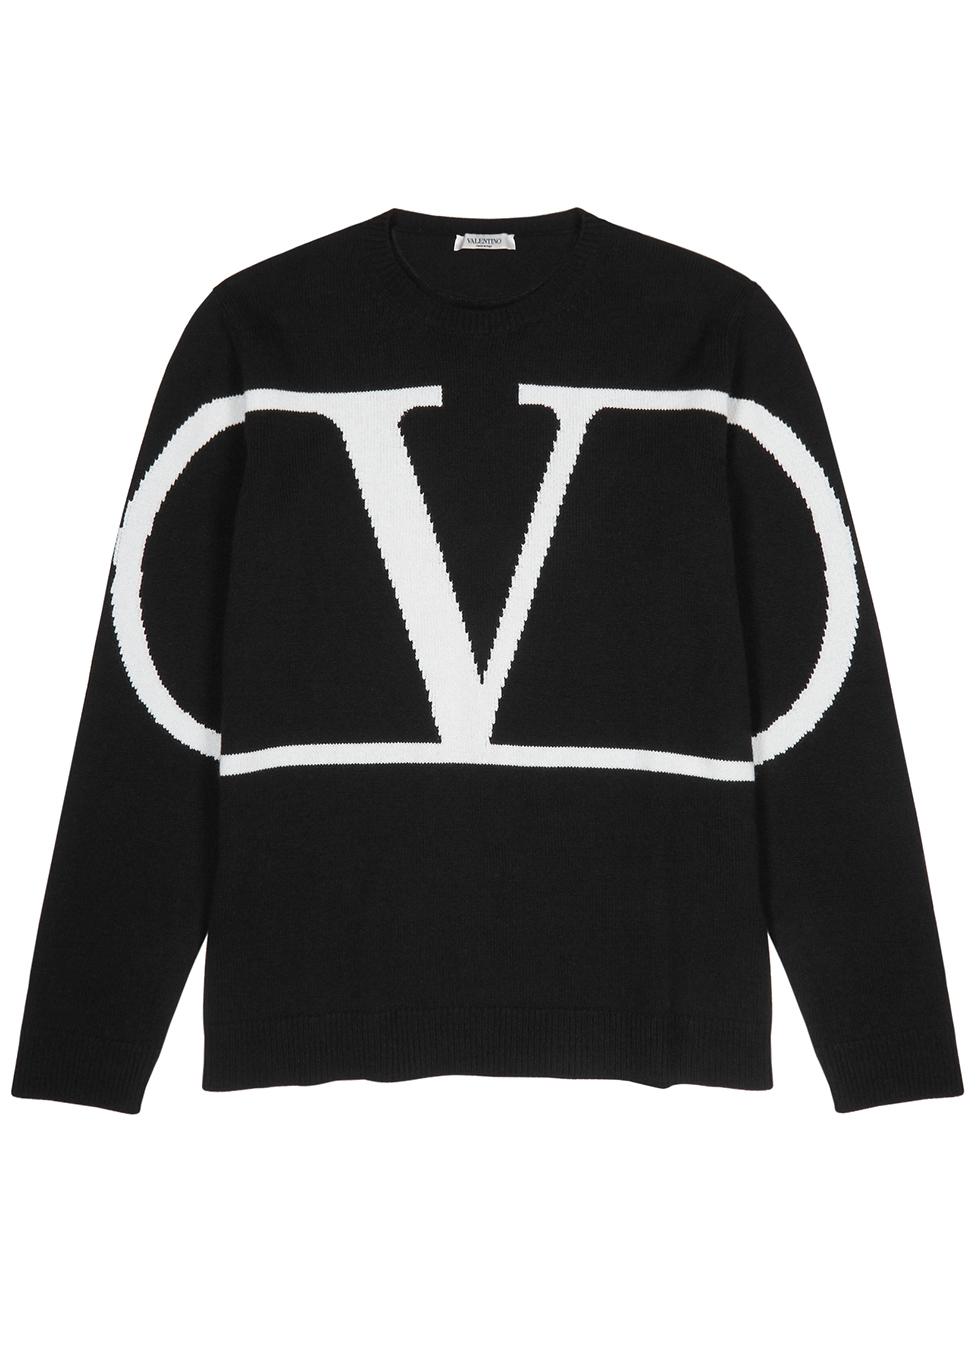 Black logo cashmere jumper - Valentino